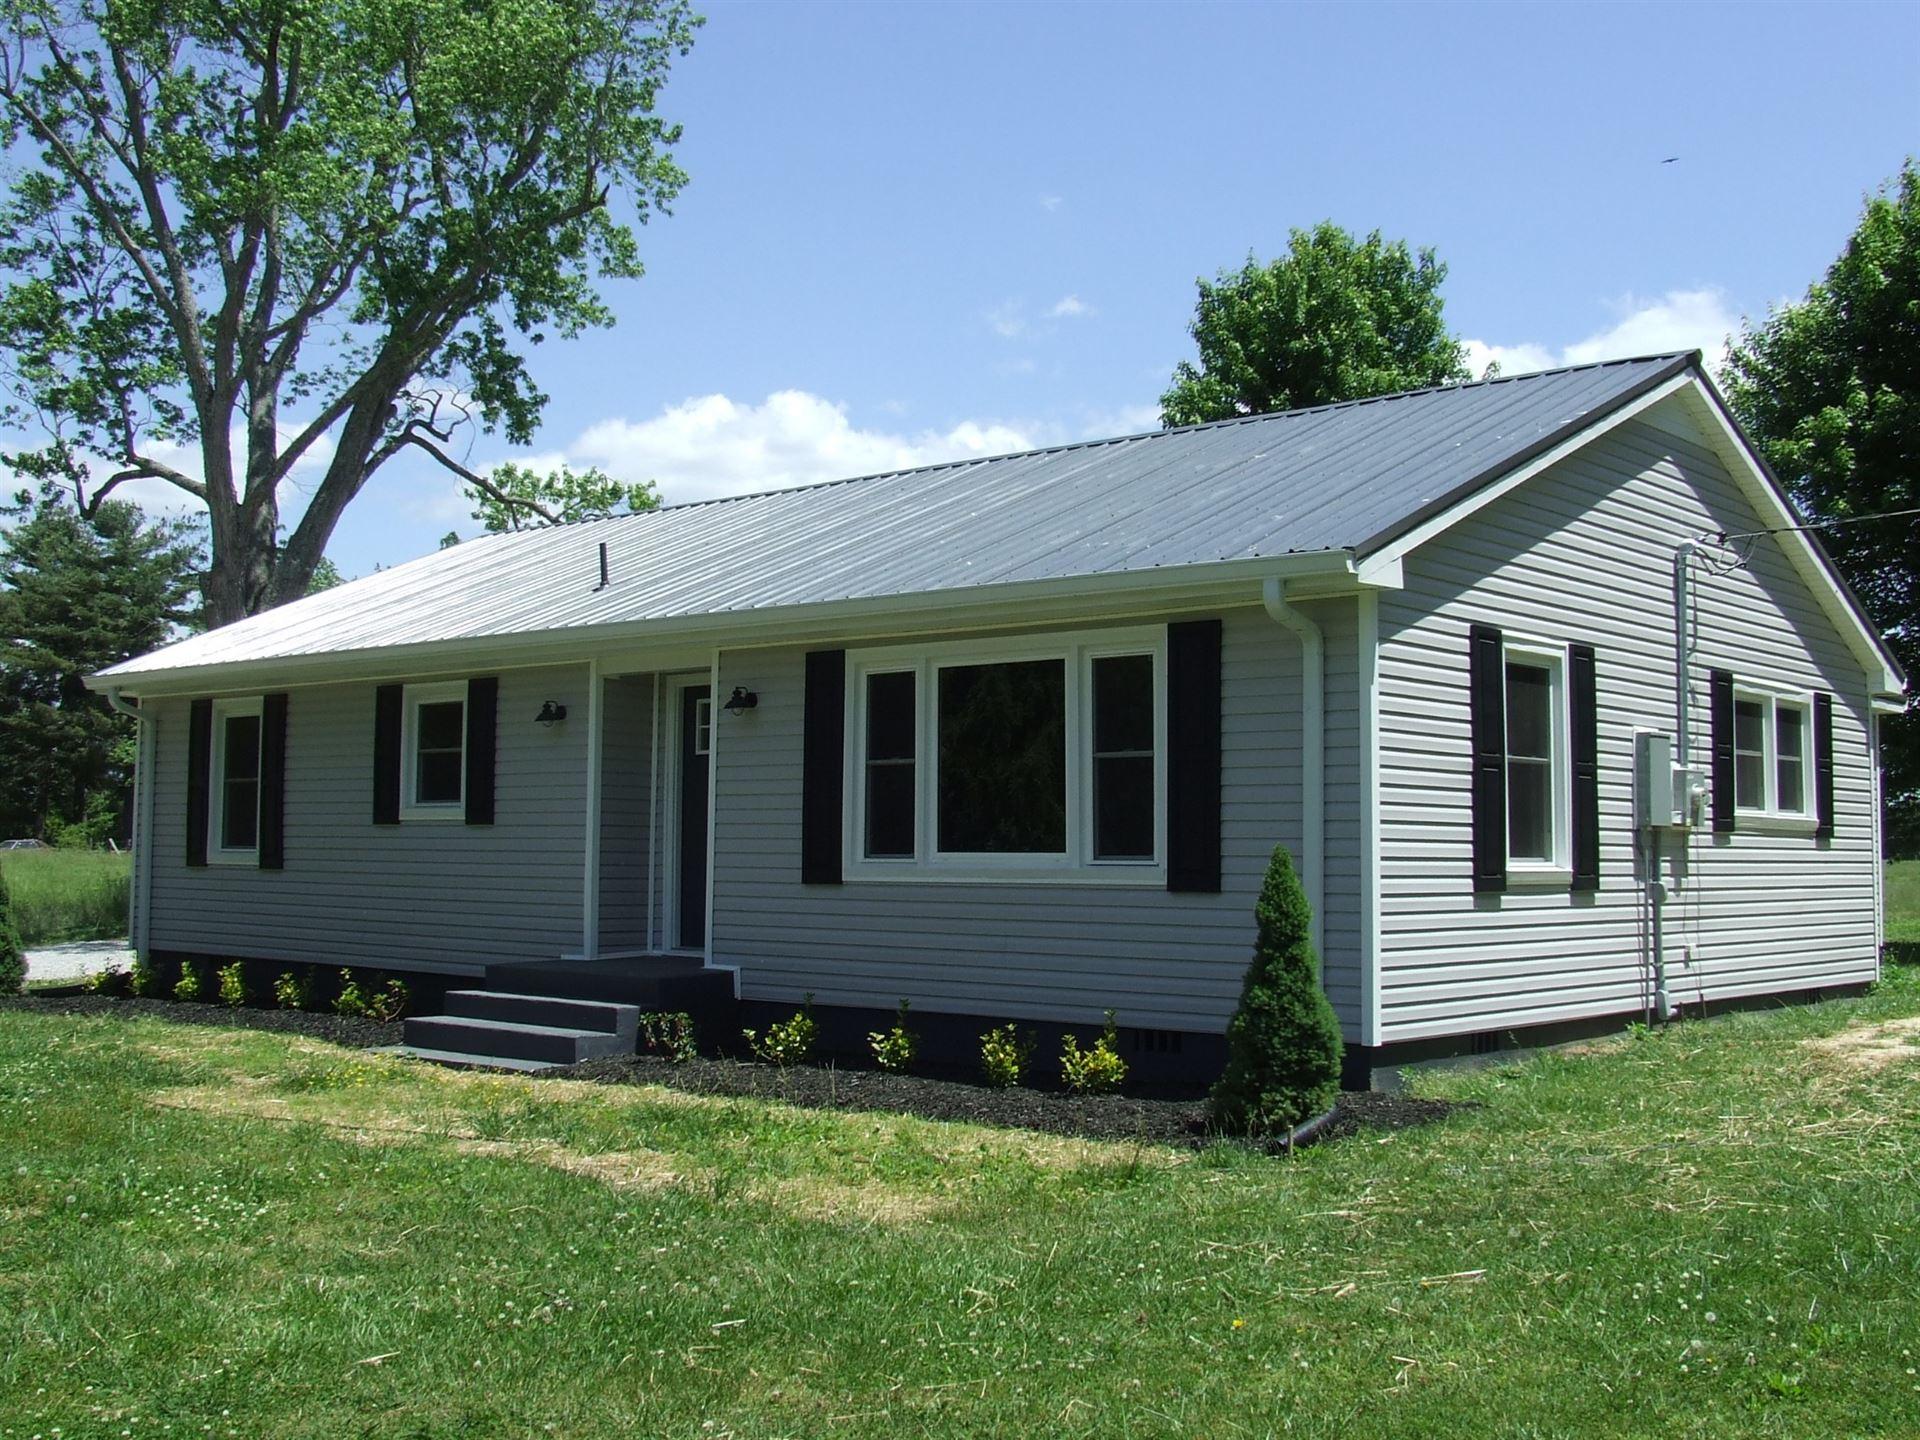 166 Bethany Rd, McMinnville, TN 37110 - MLS#: 2253549